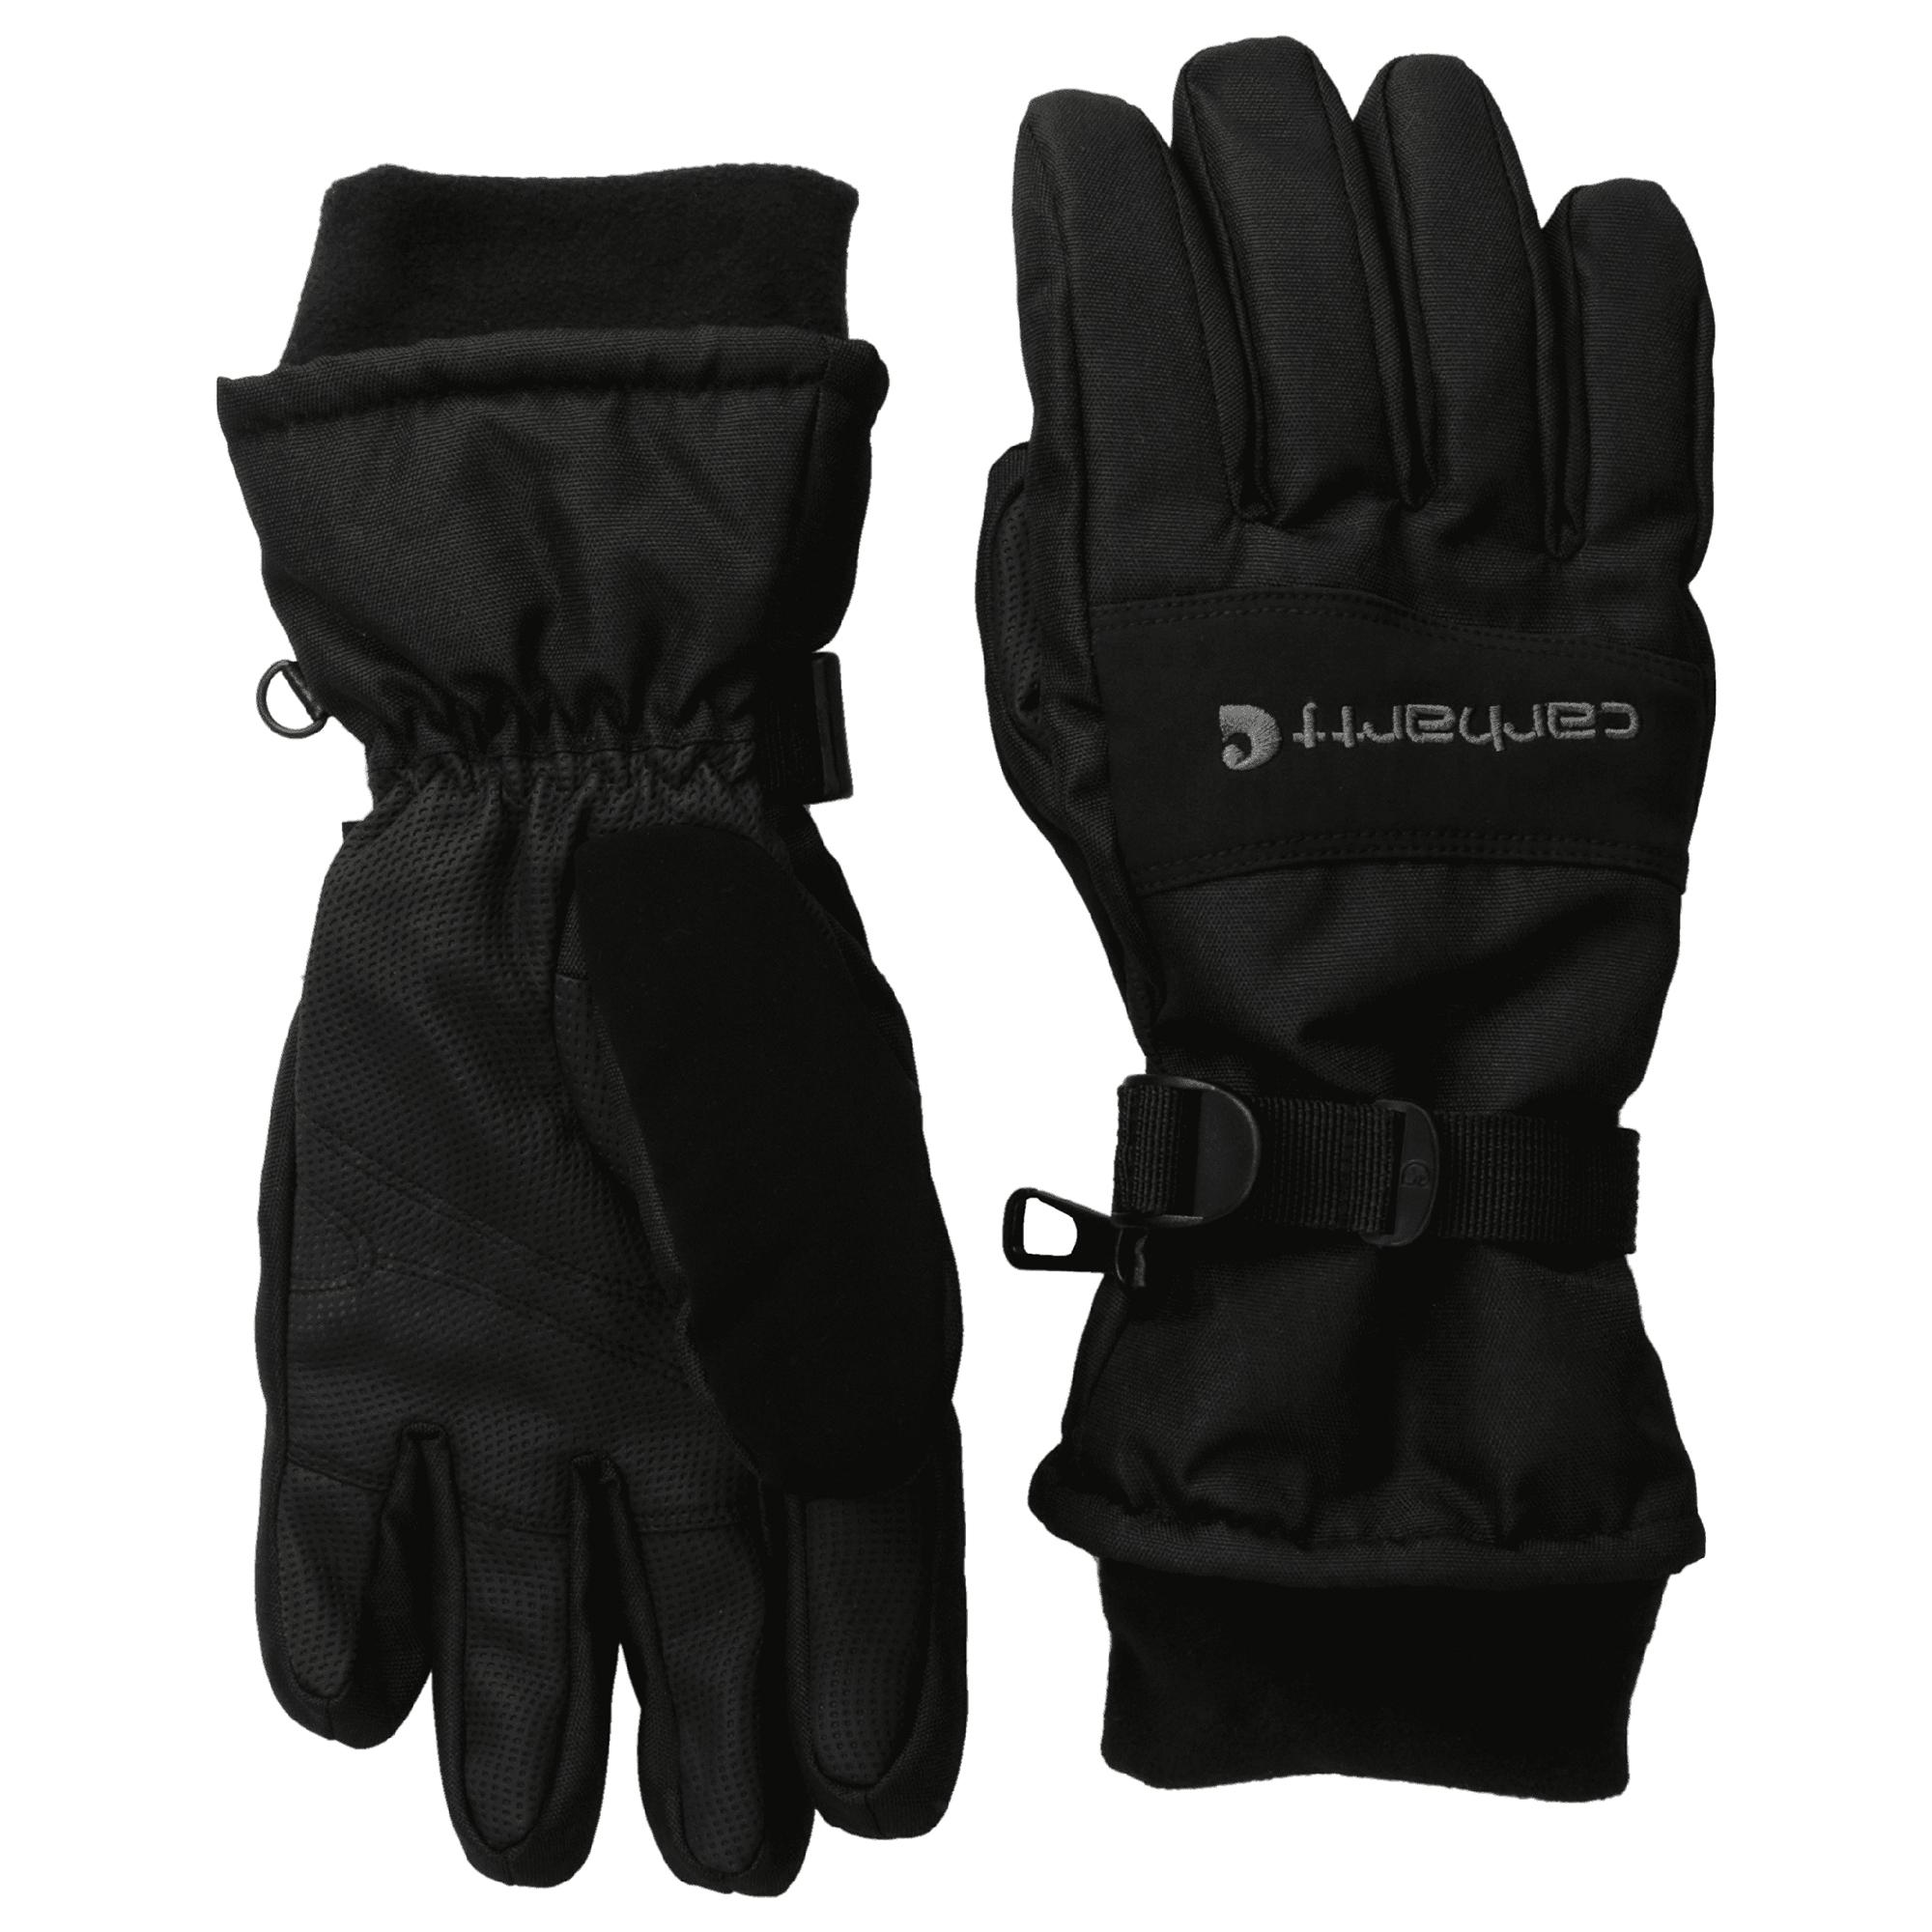 Carhartt Men's WP Glove